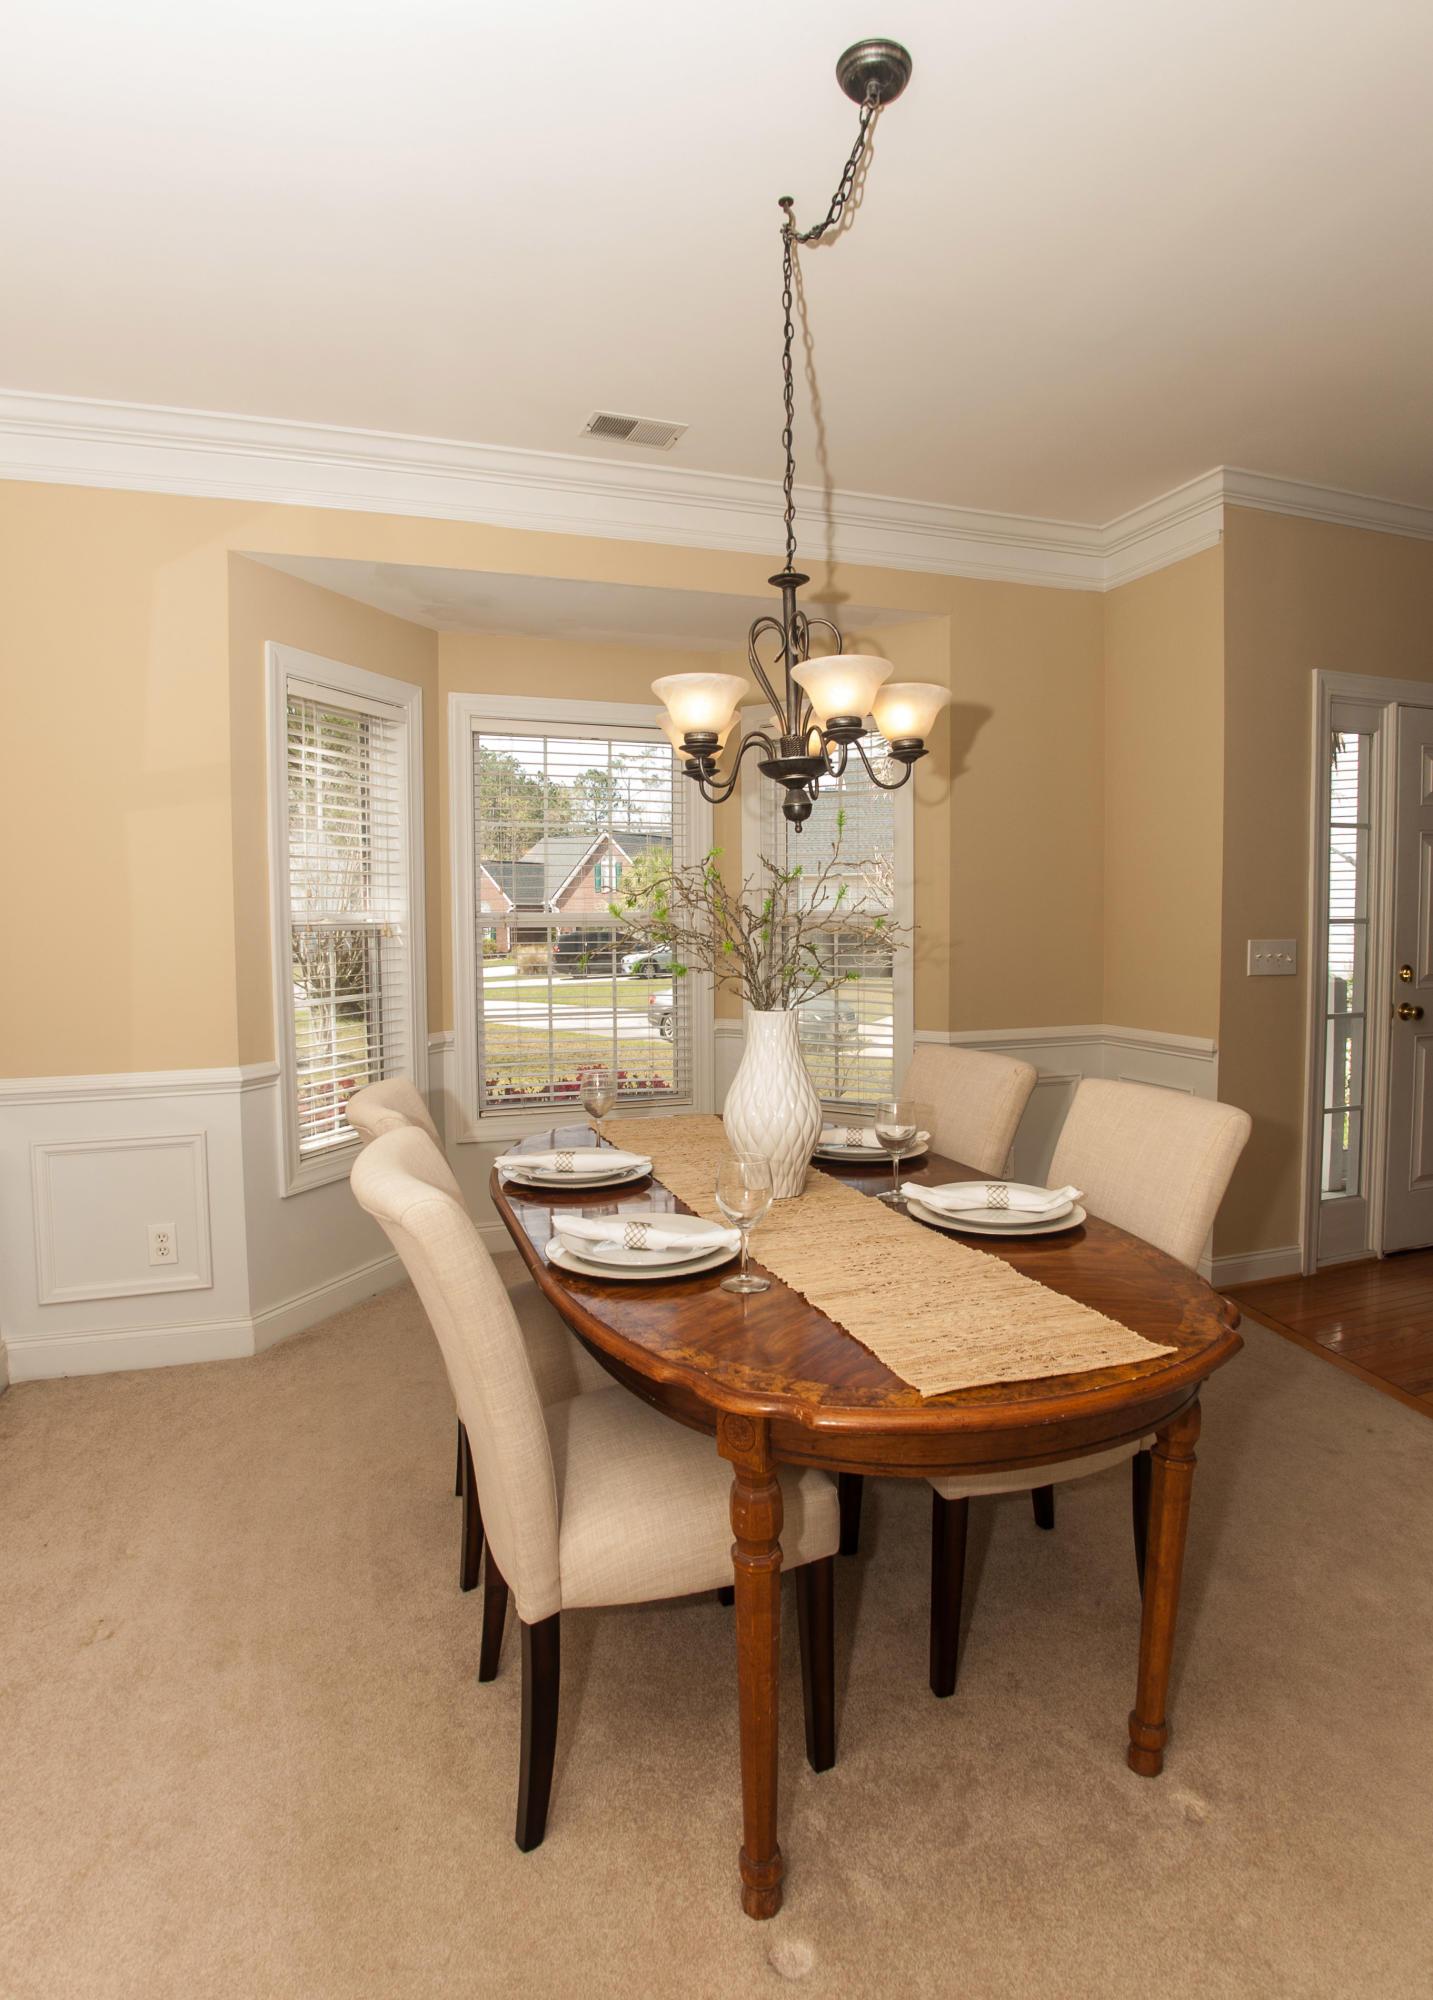 Dunes West Homes For Sale - 2520 Deer Walk, Mount Pleasant, SC - 19